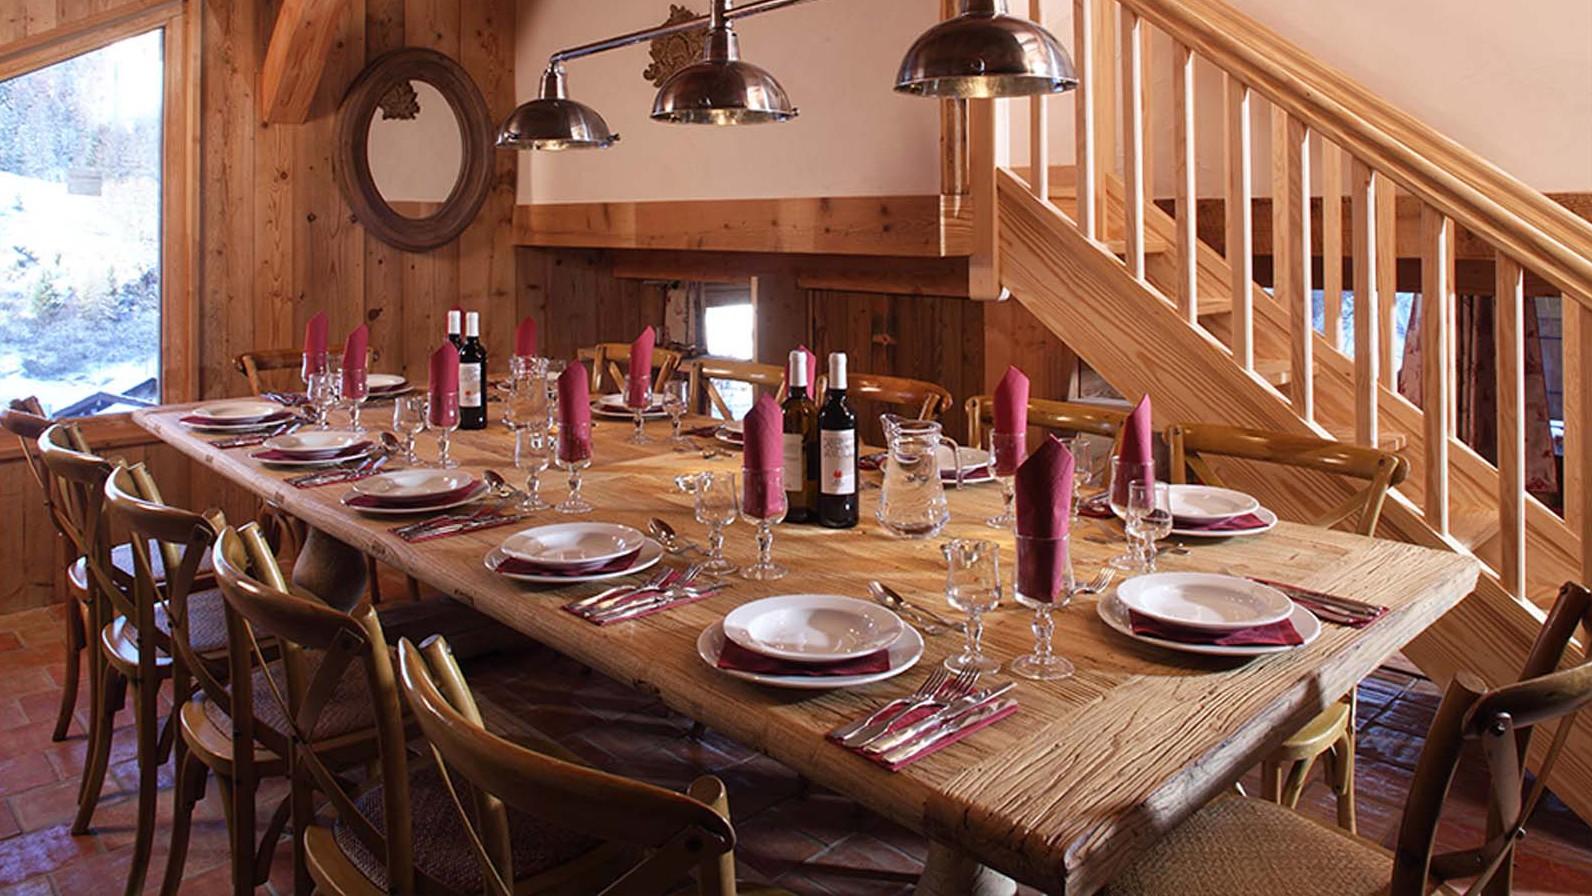 Dining Room in Chalet Klosters - Ski Chalet in La Plagne, France